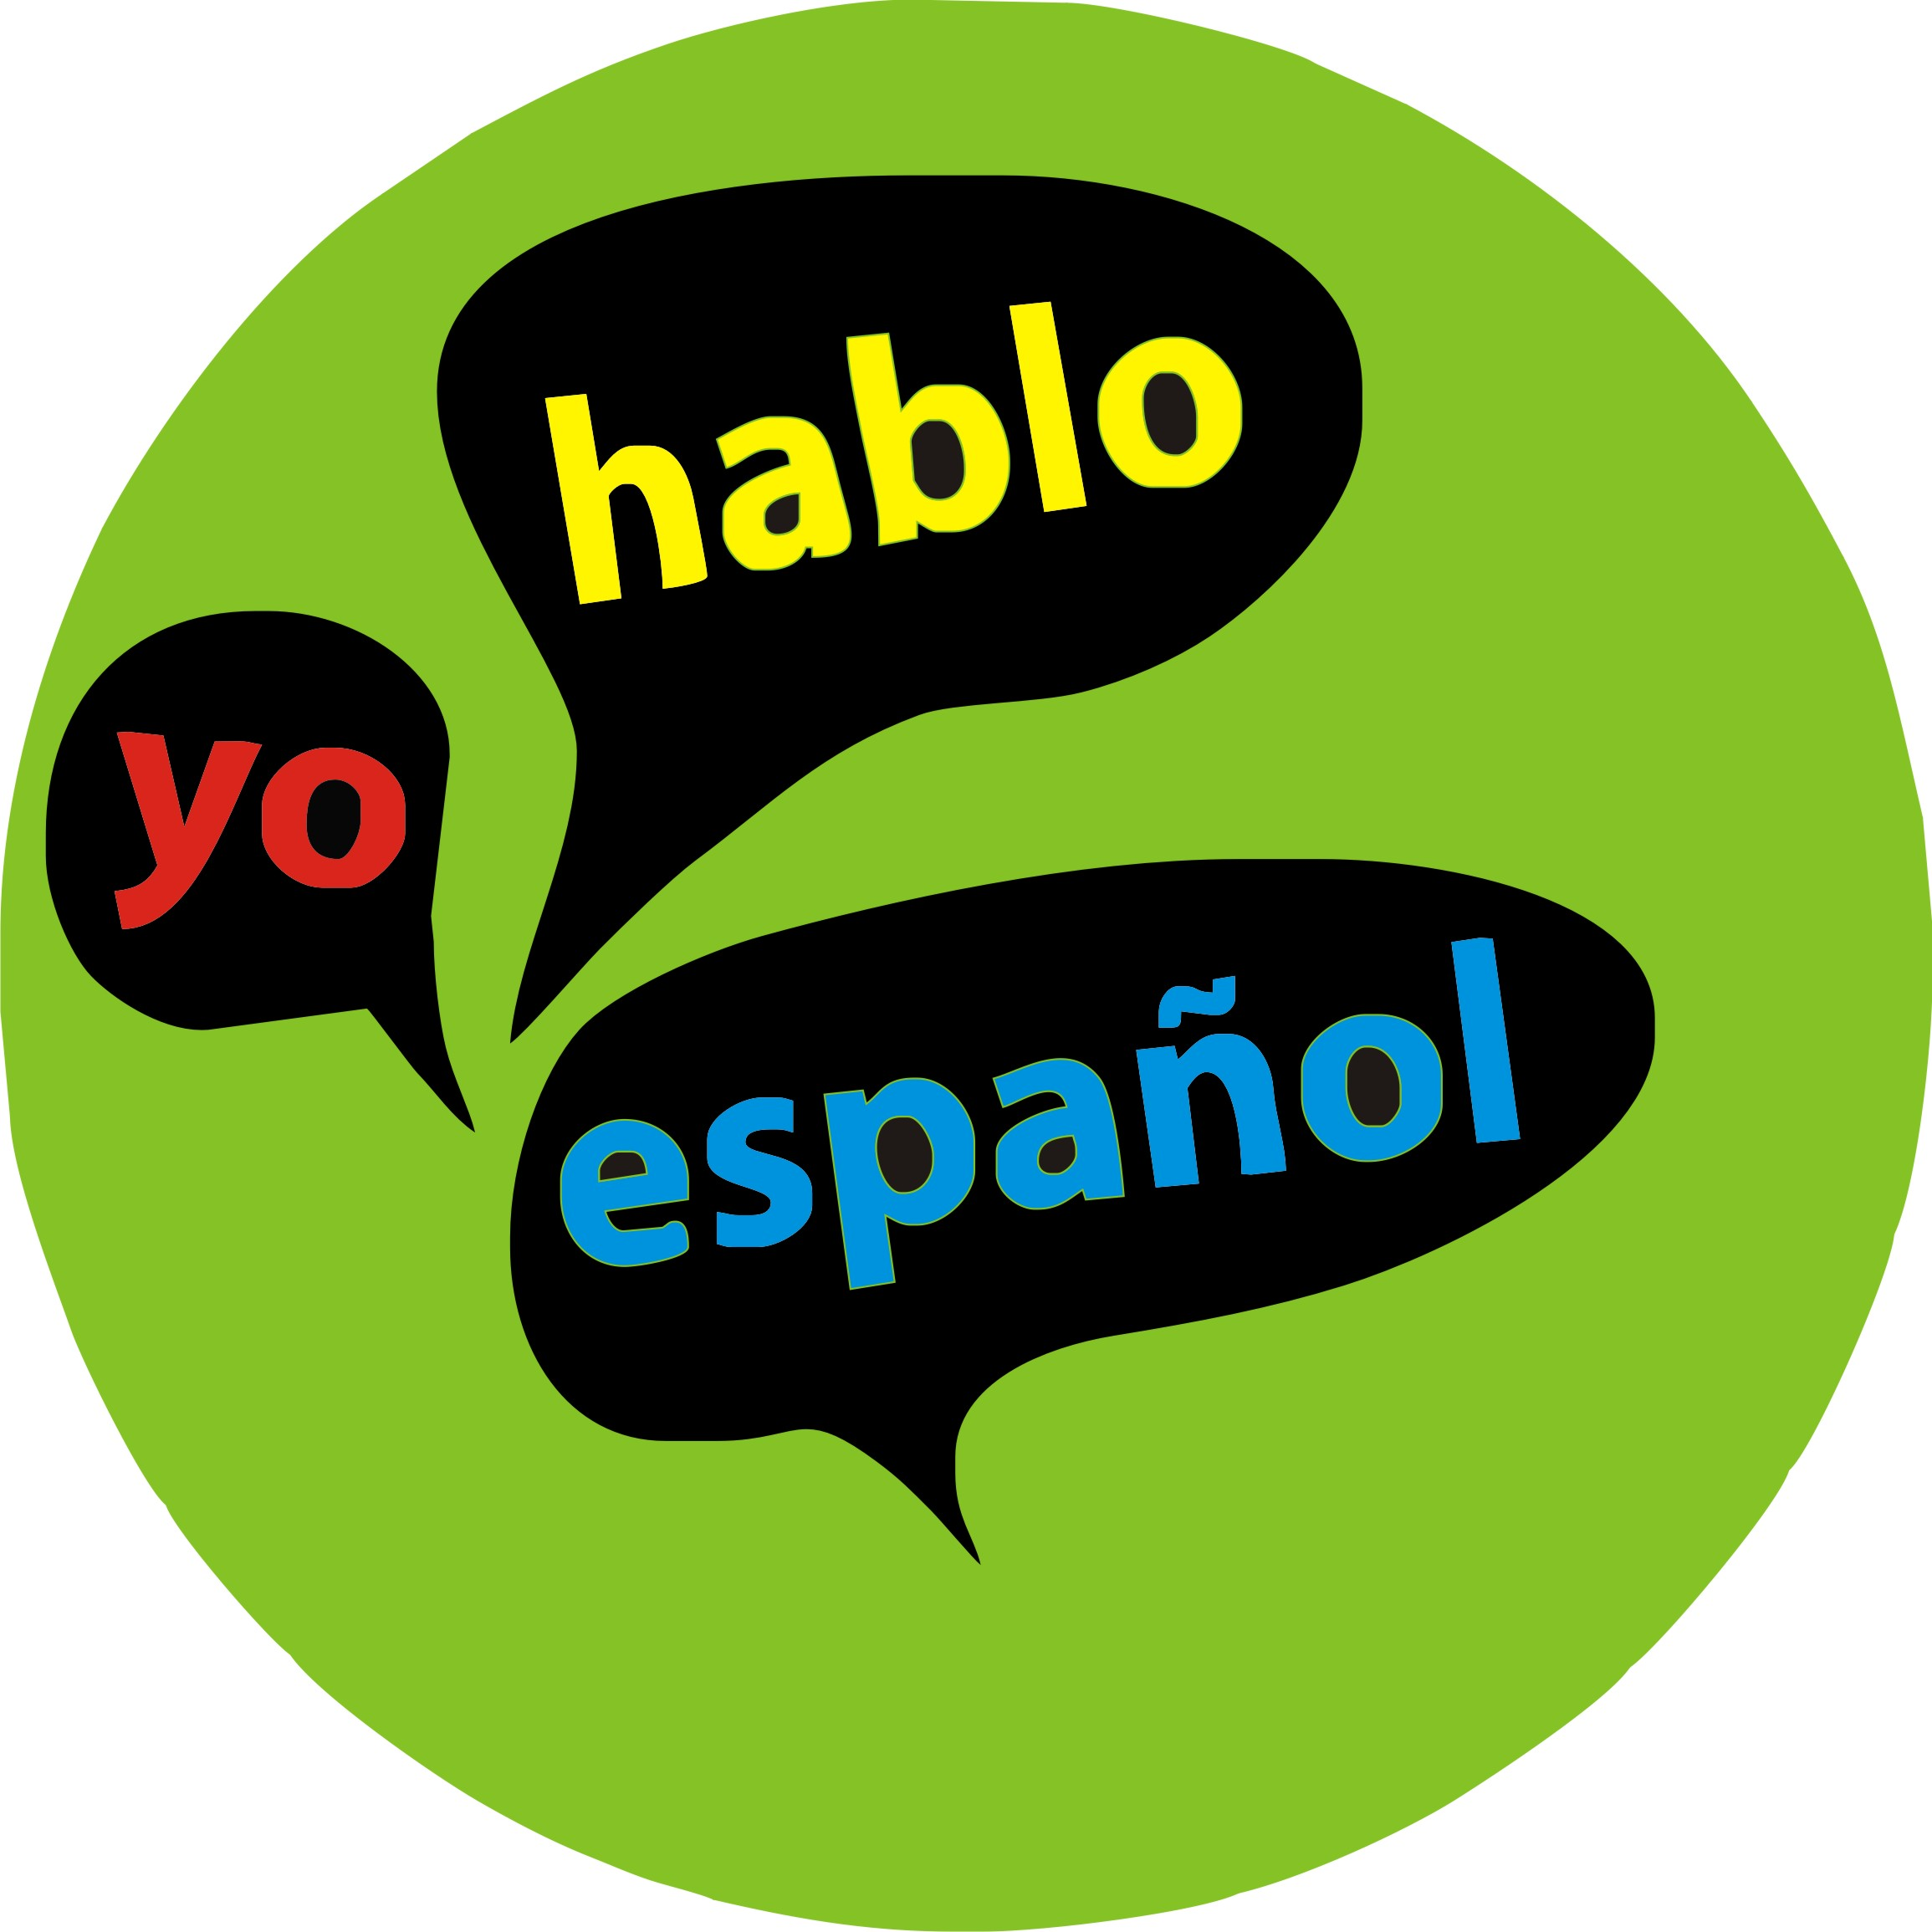 Free Spanish Cliparts, Download Free Clip Art, Free Clip Art.